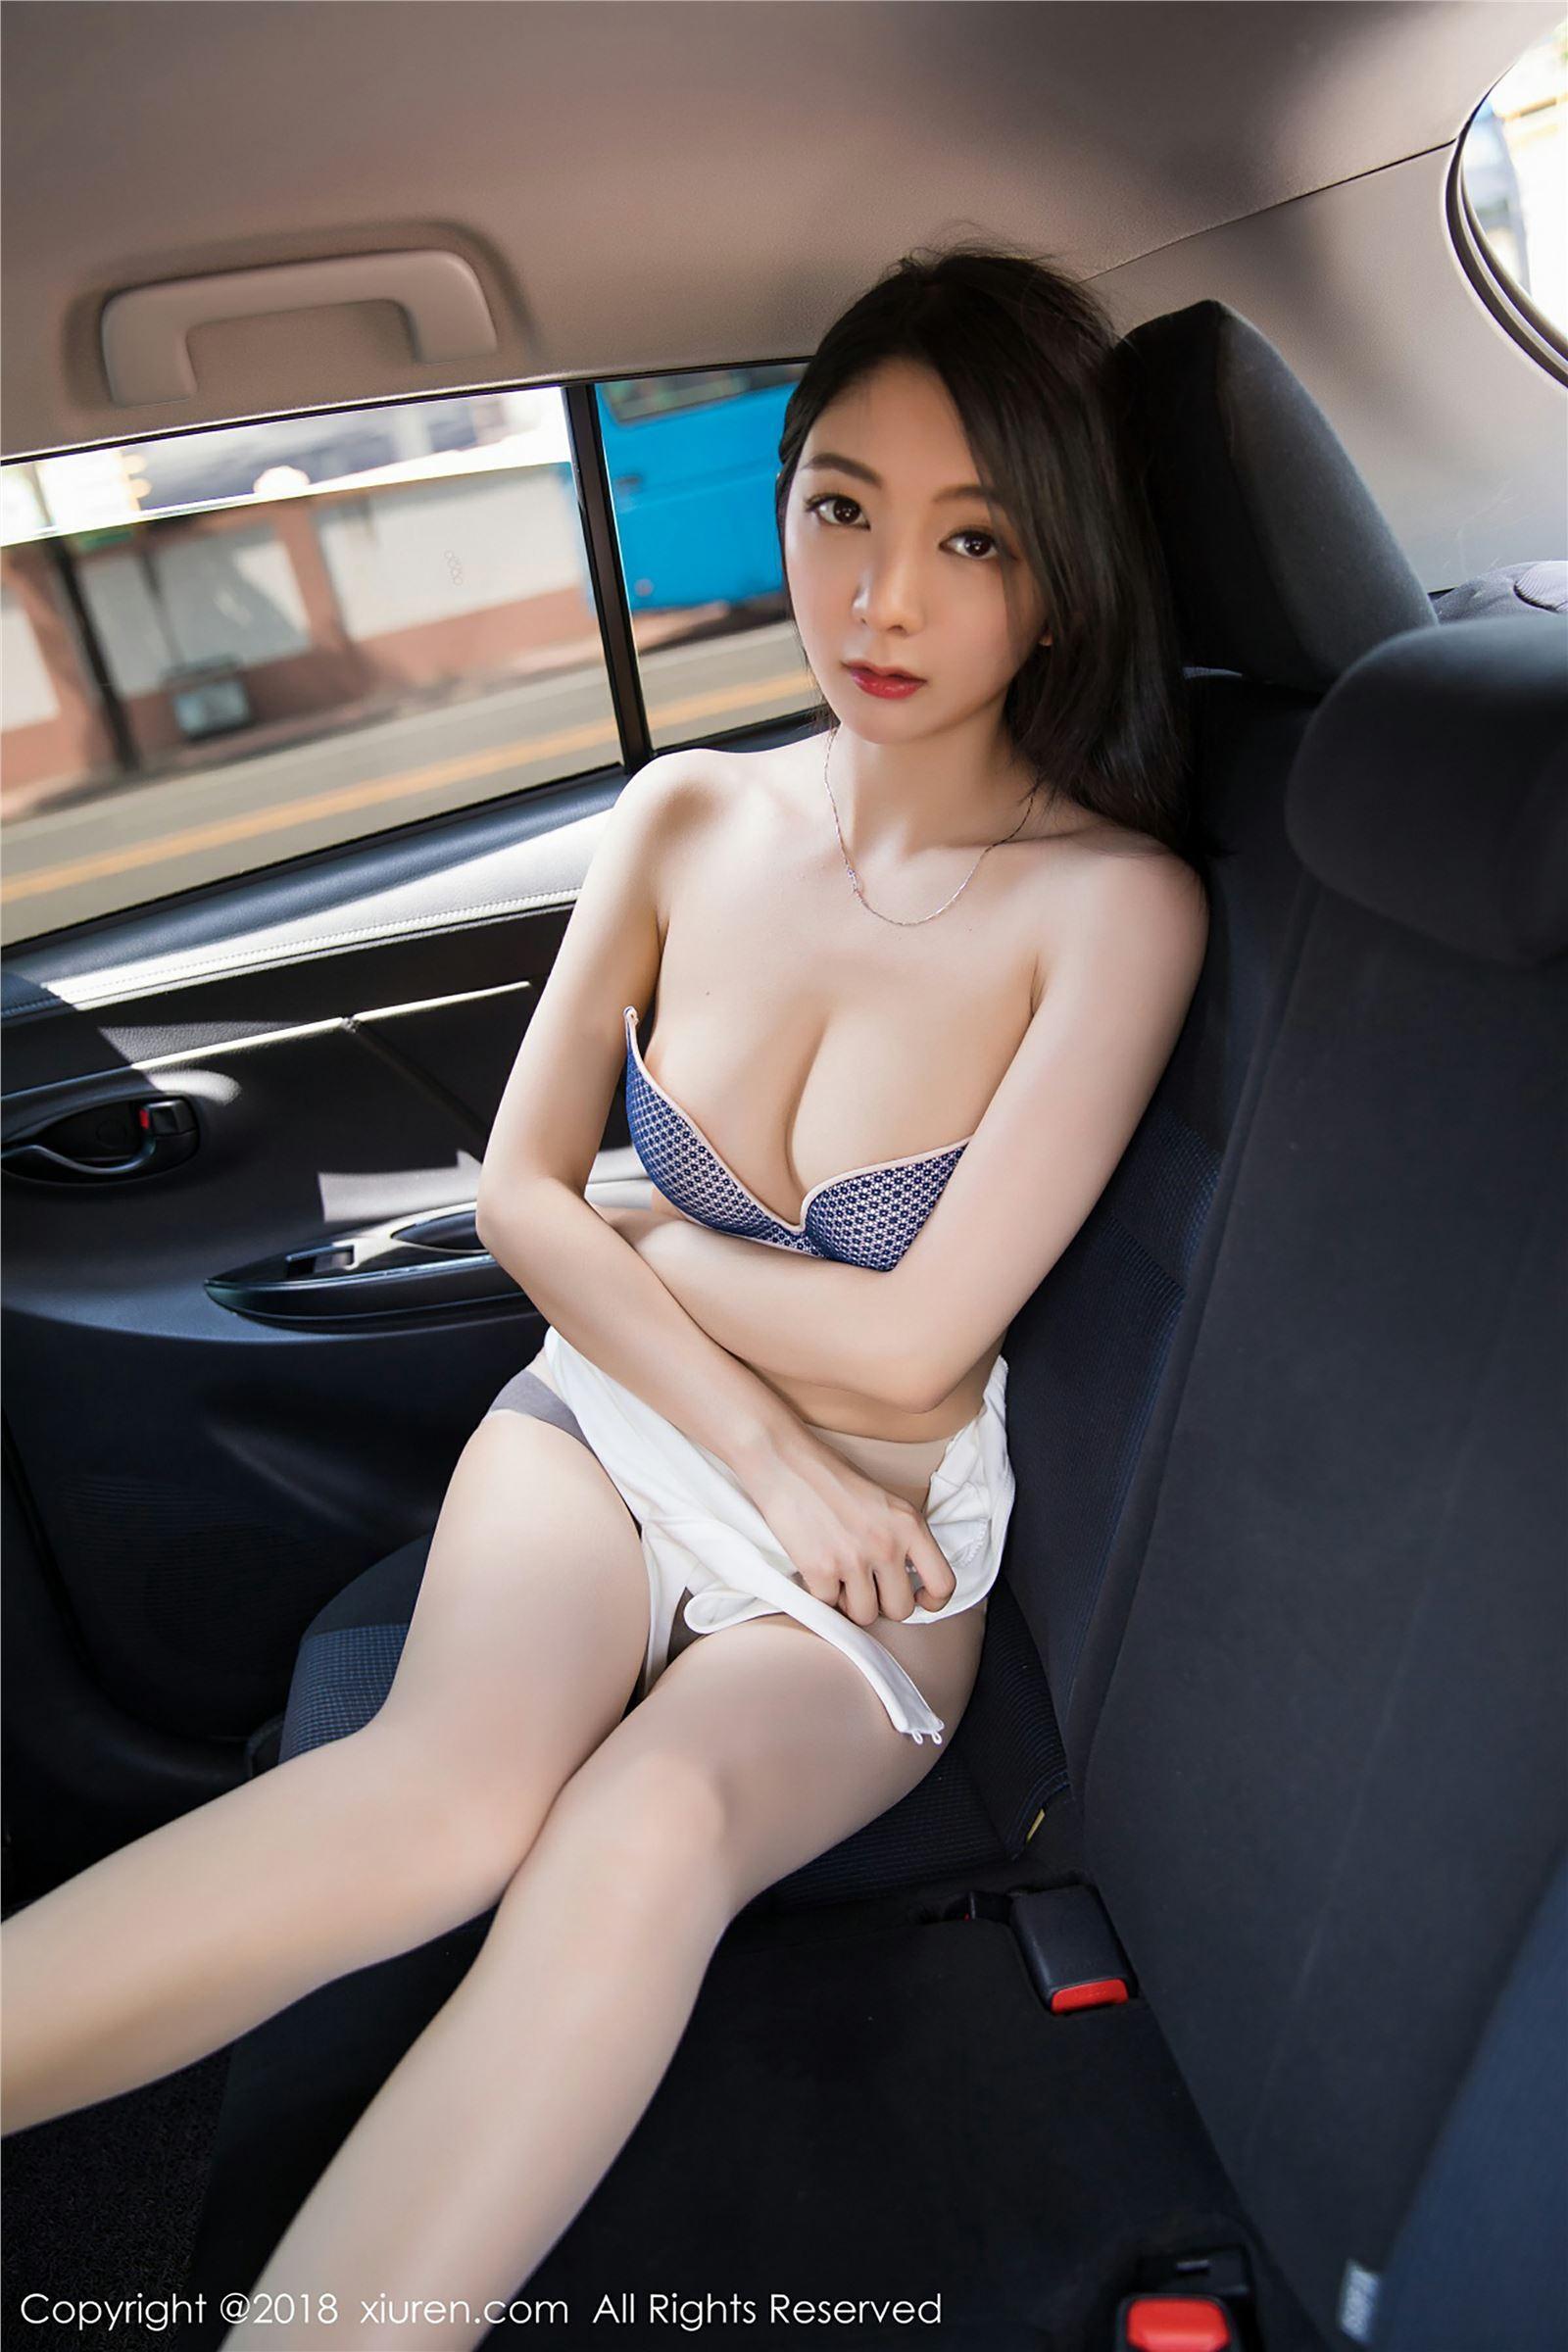 XIUREN秀人网 2018.09.05 No.1149 Angela小热巴